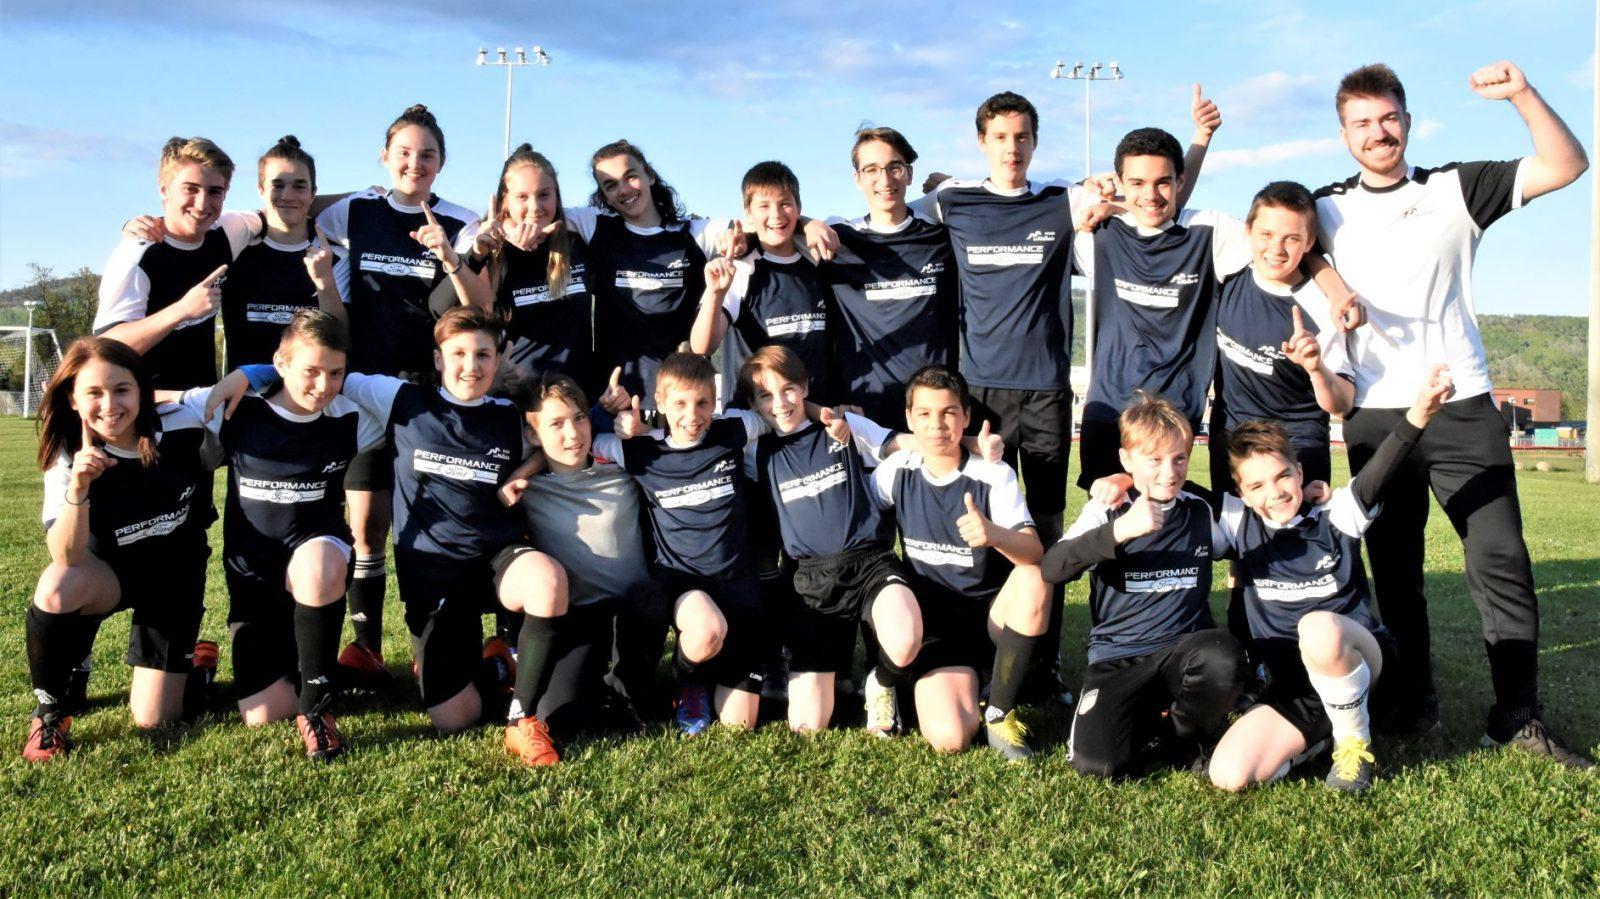 Soccer : Performance Ford U14 obtient le 2e rang du classement